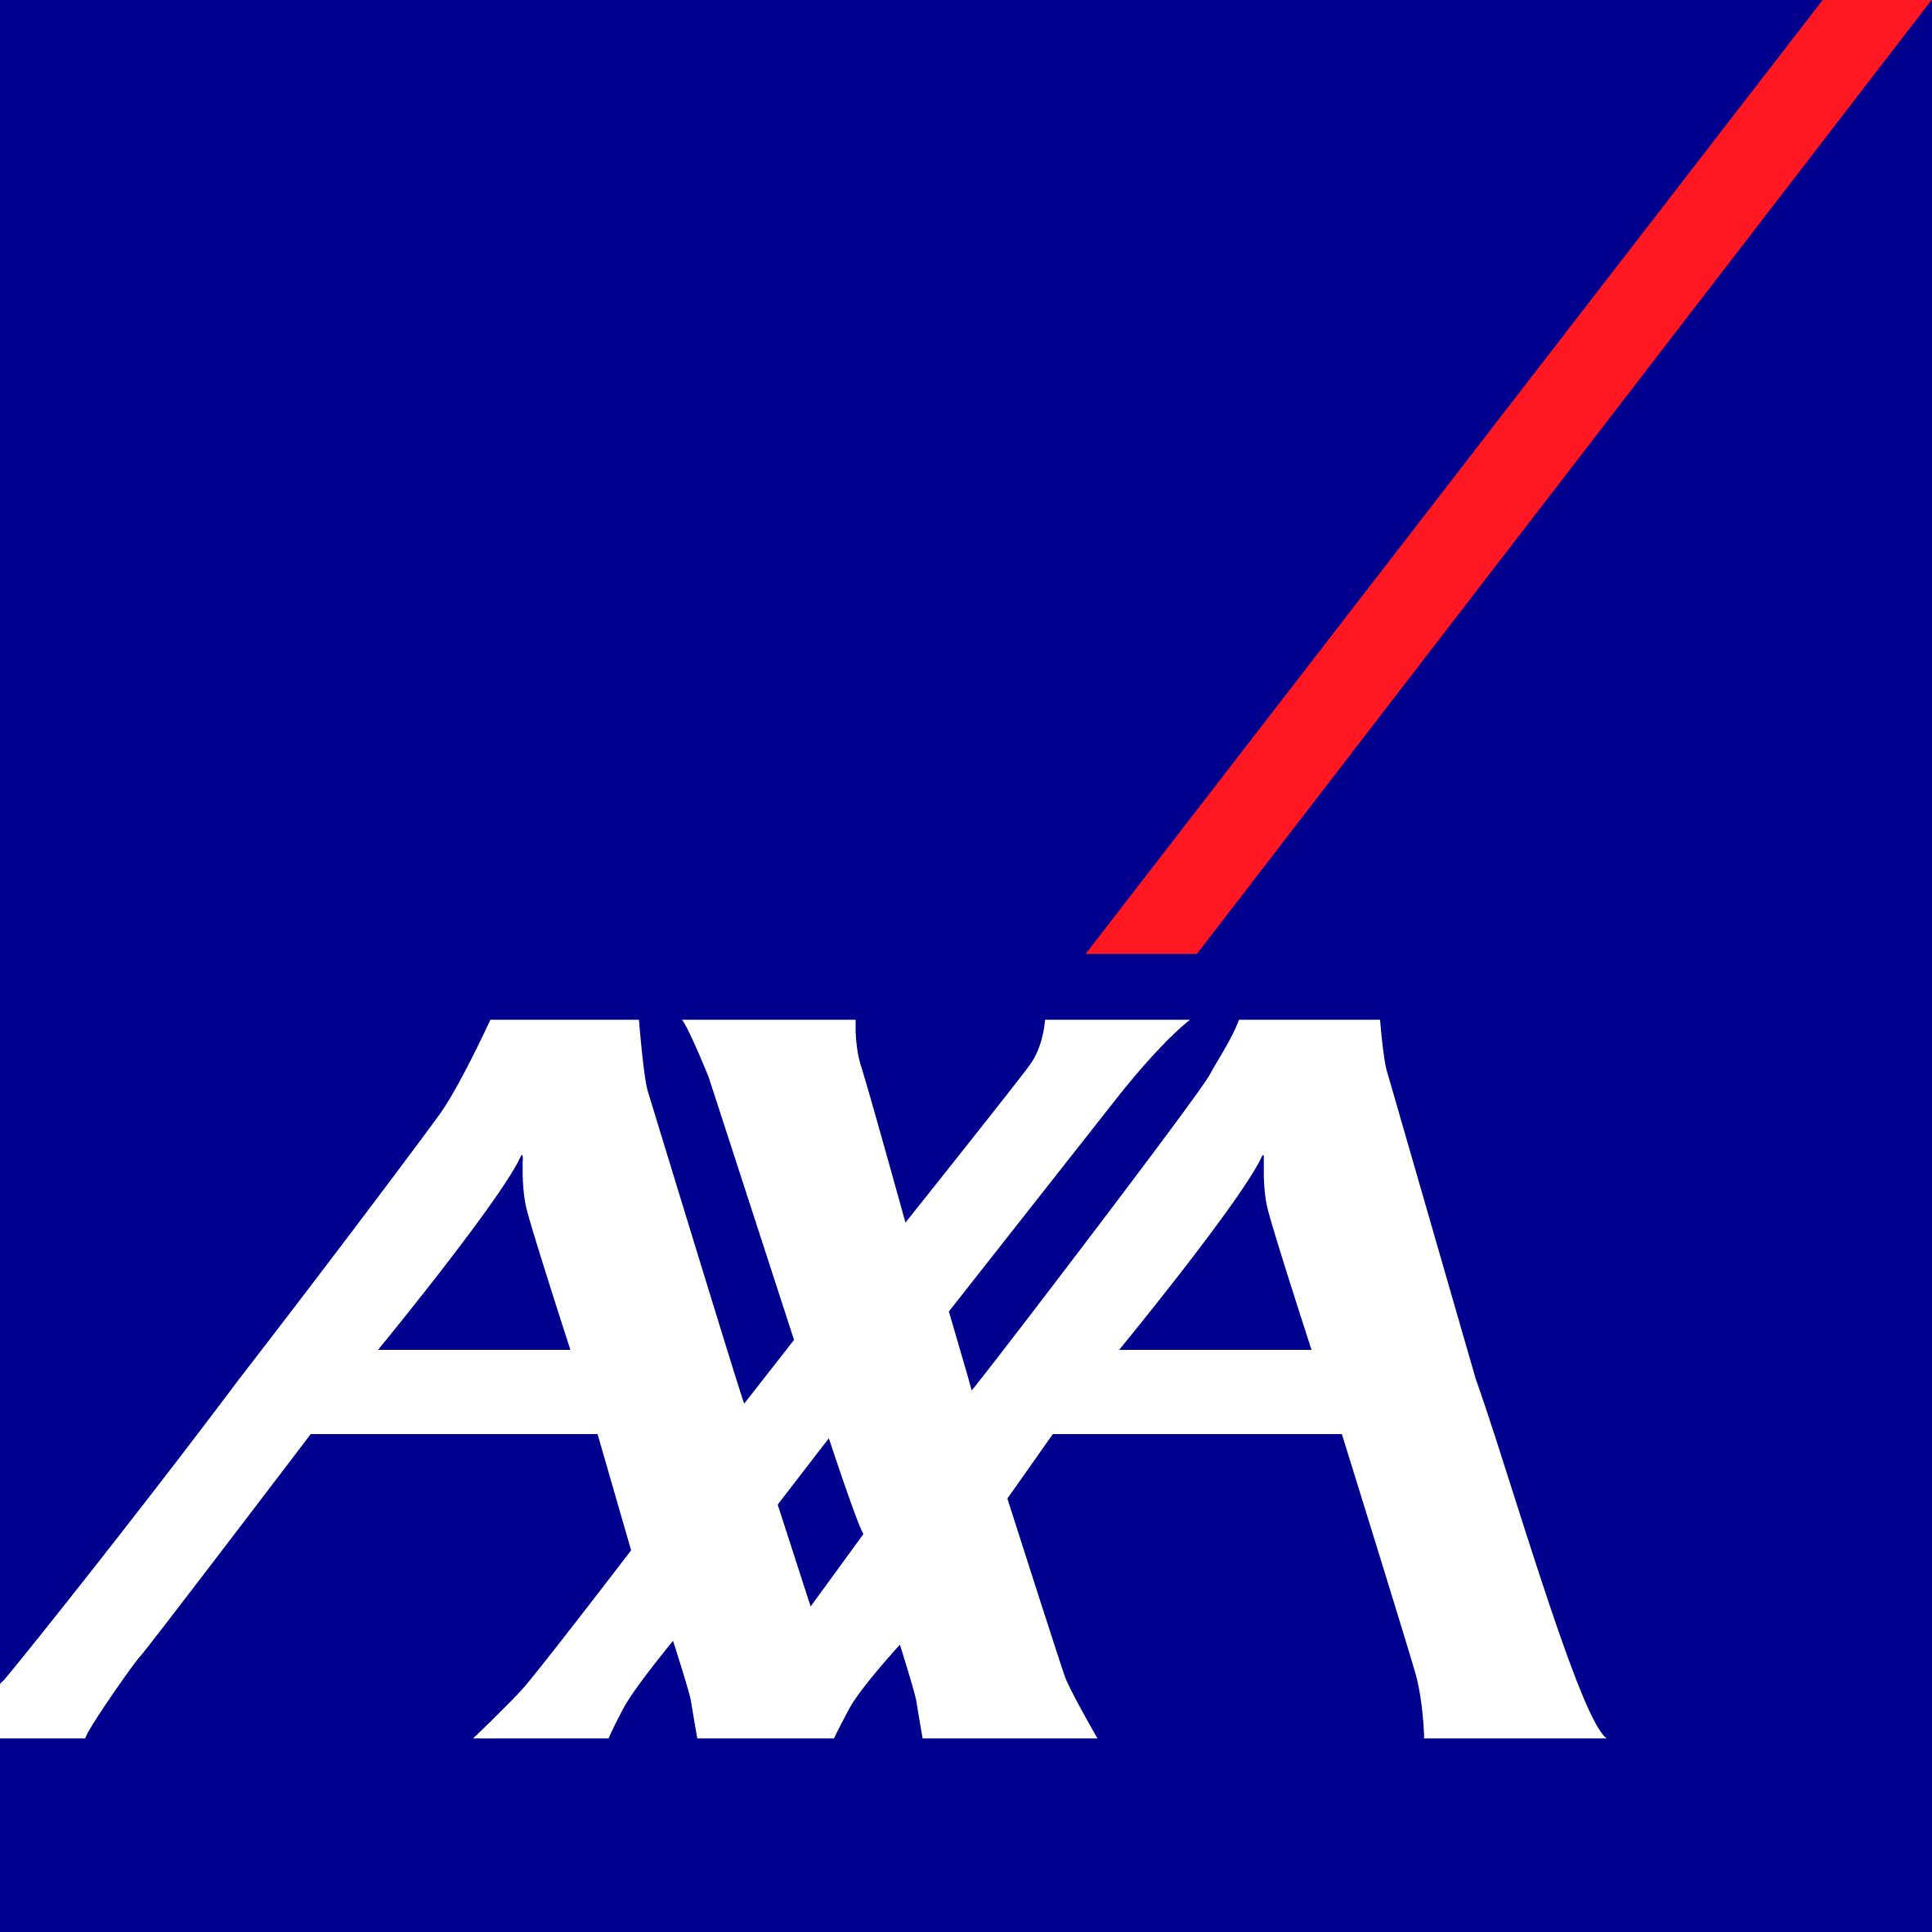 AXA Business Services logo - JFH